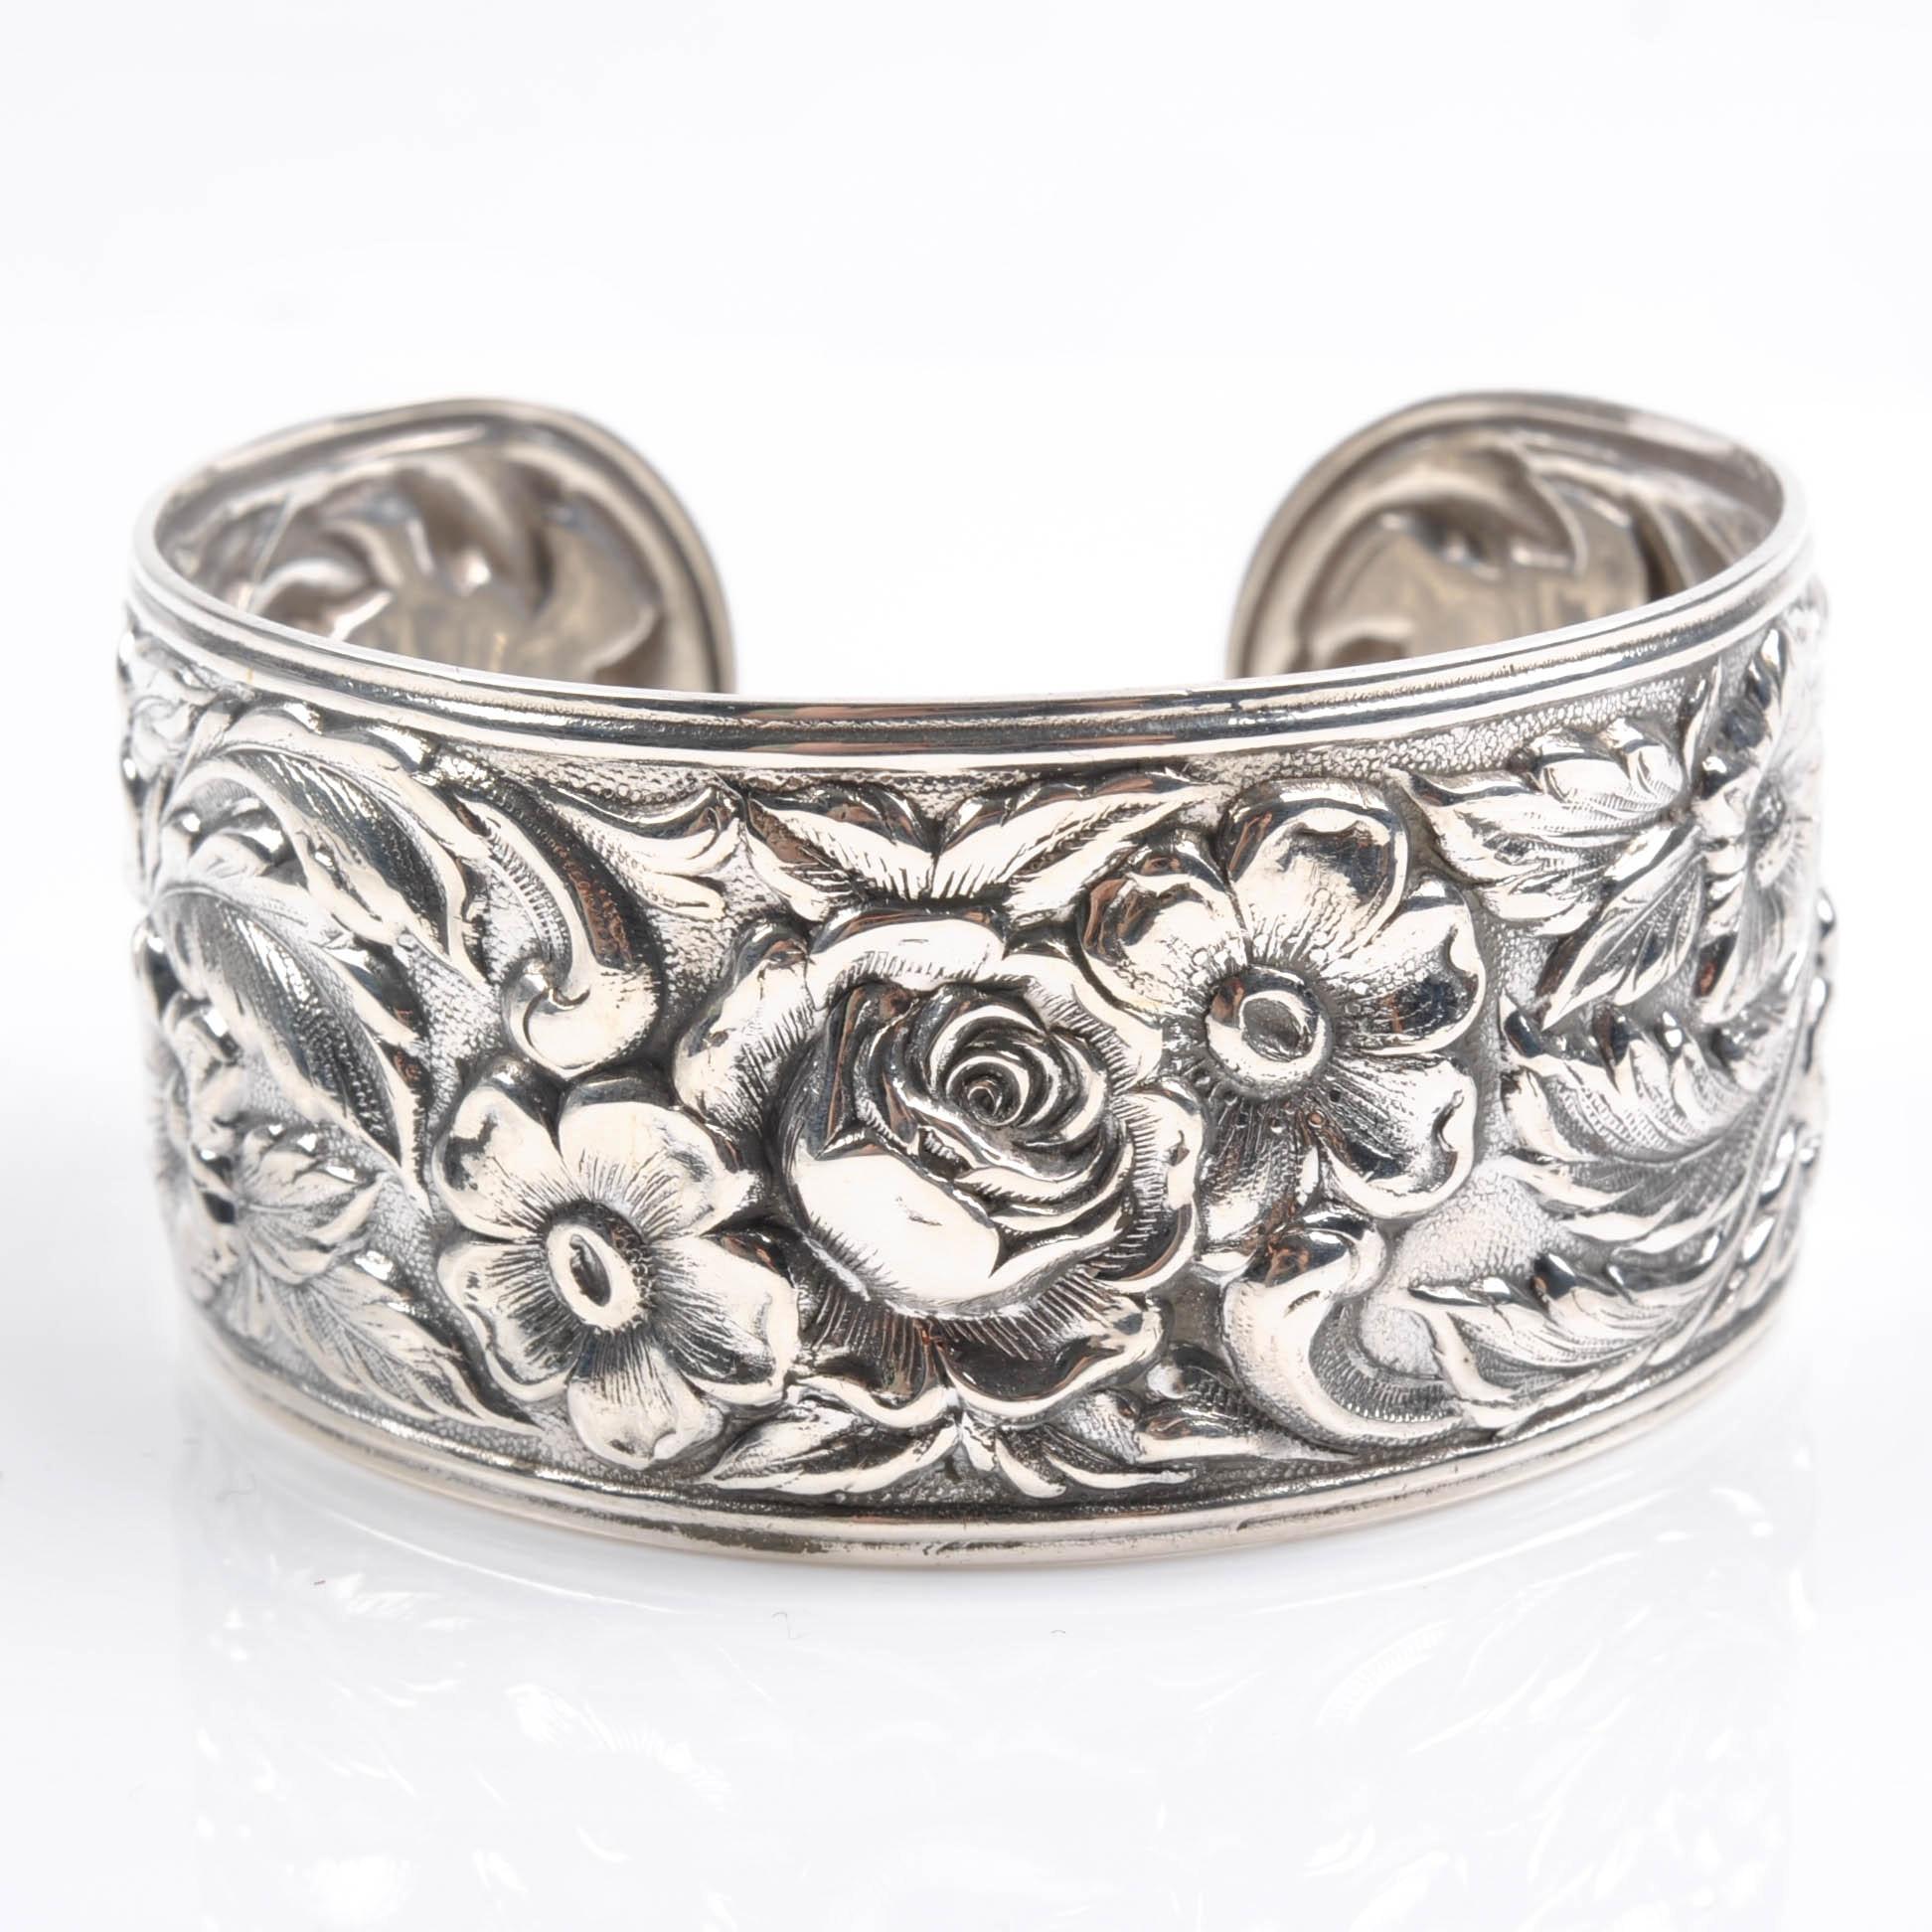 S. Kirk & Son Sterling Silver Floral Motif Cuff Bracelet